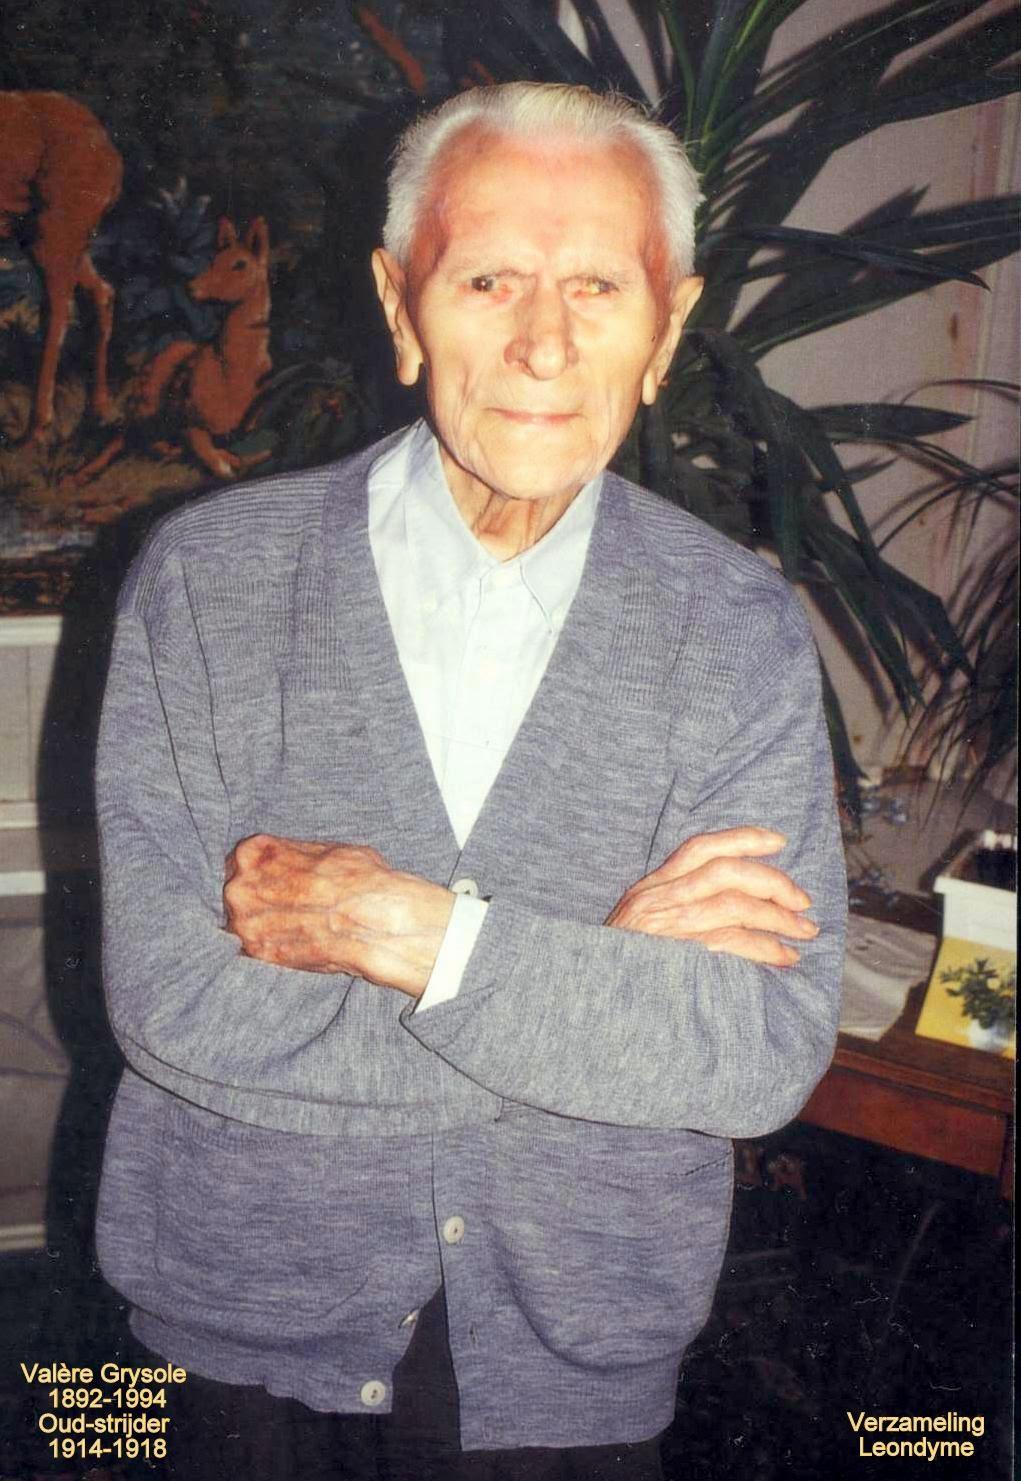 Oud-strijder-vuurkruiser-klaroenblazer Valère Grysole 1892-1994, gevierd als honderdjarige. Verzameling Leondyme.